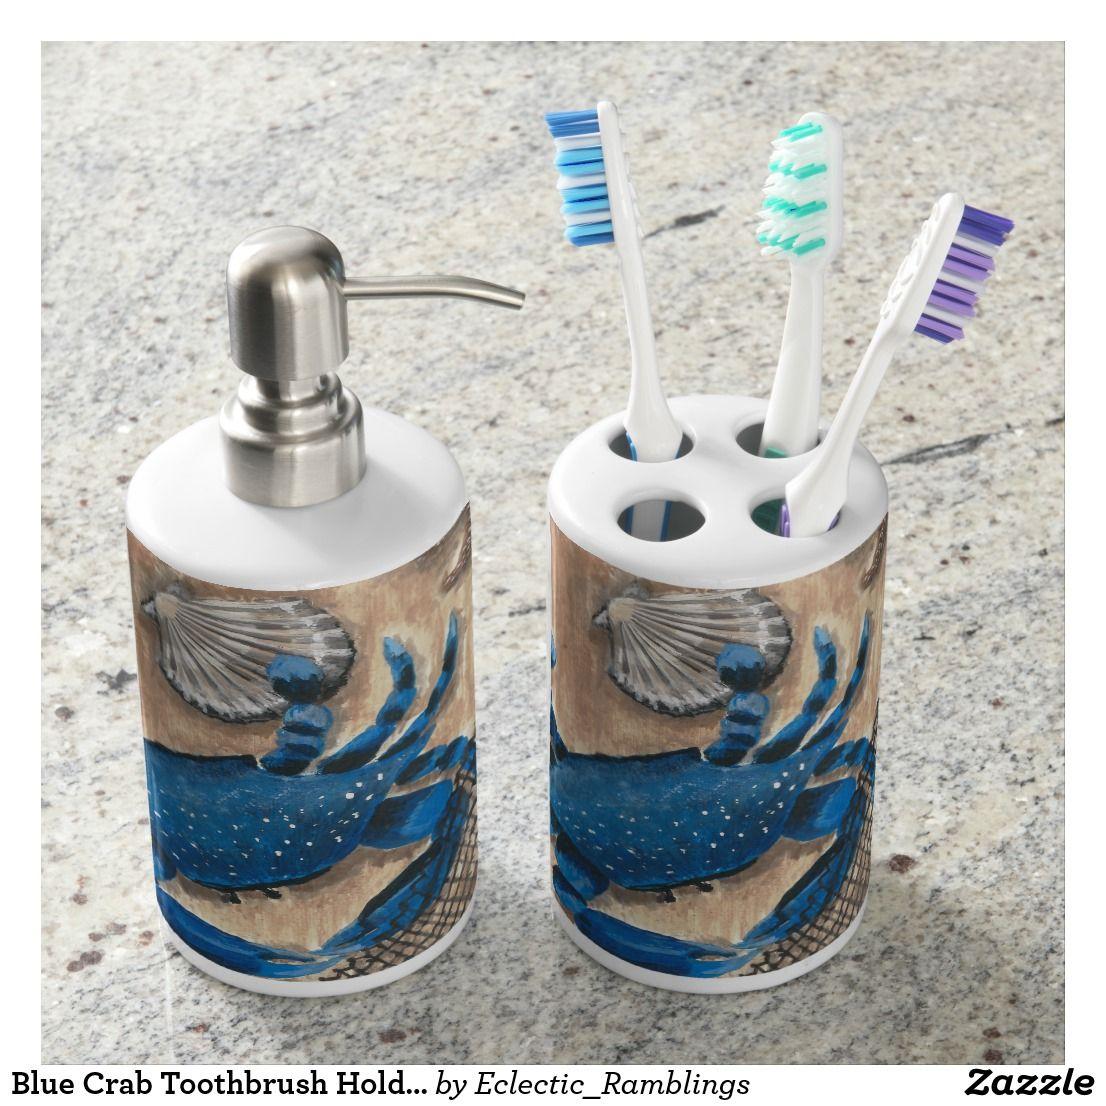 Blue Crab Toothbrush Holder Set | Bath Accessory Sets | Pinterest ...